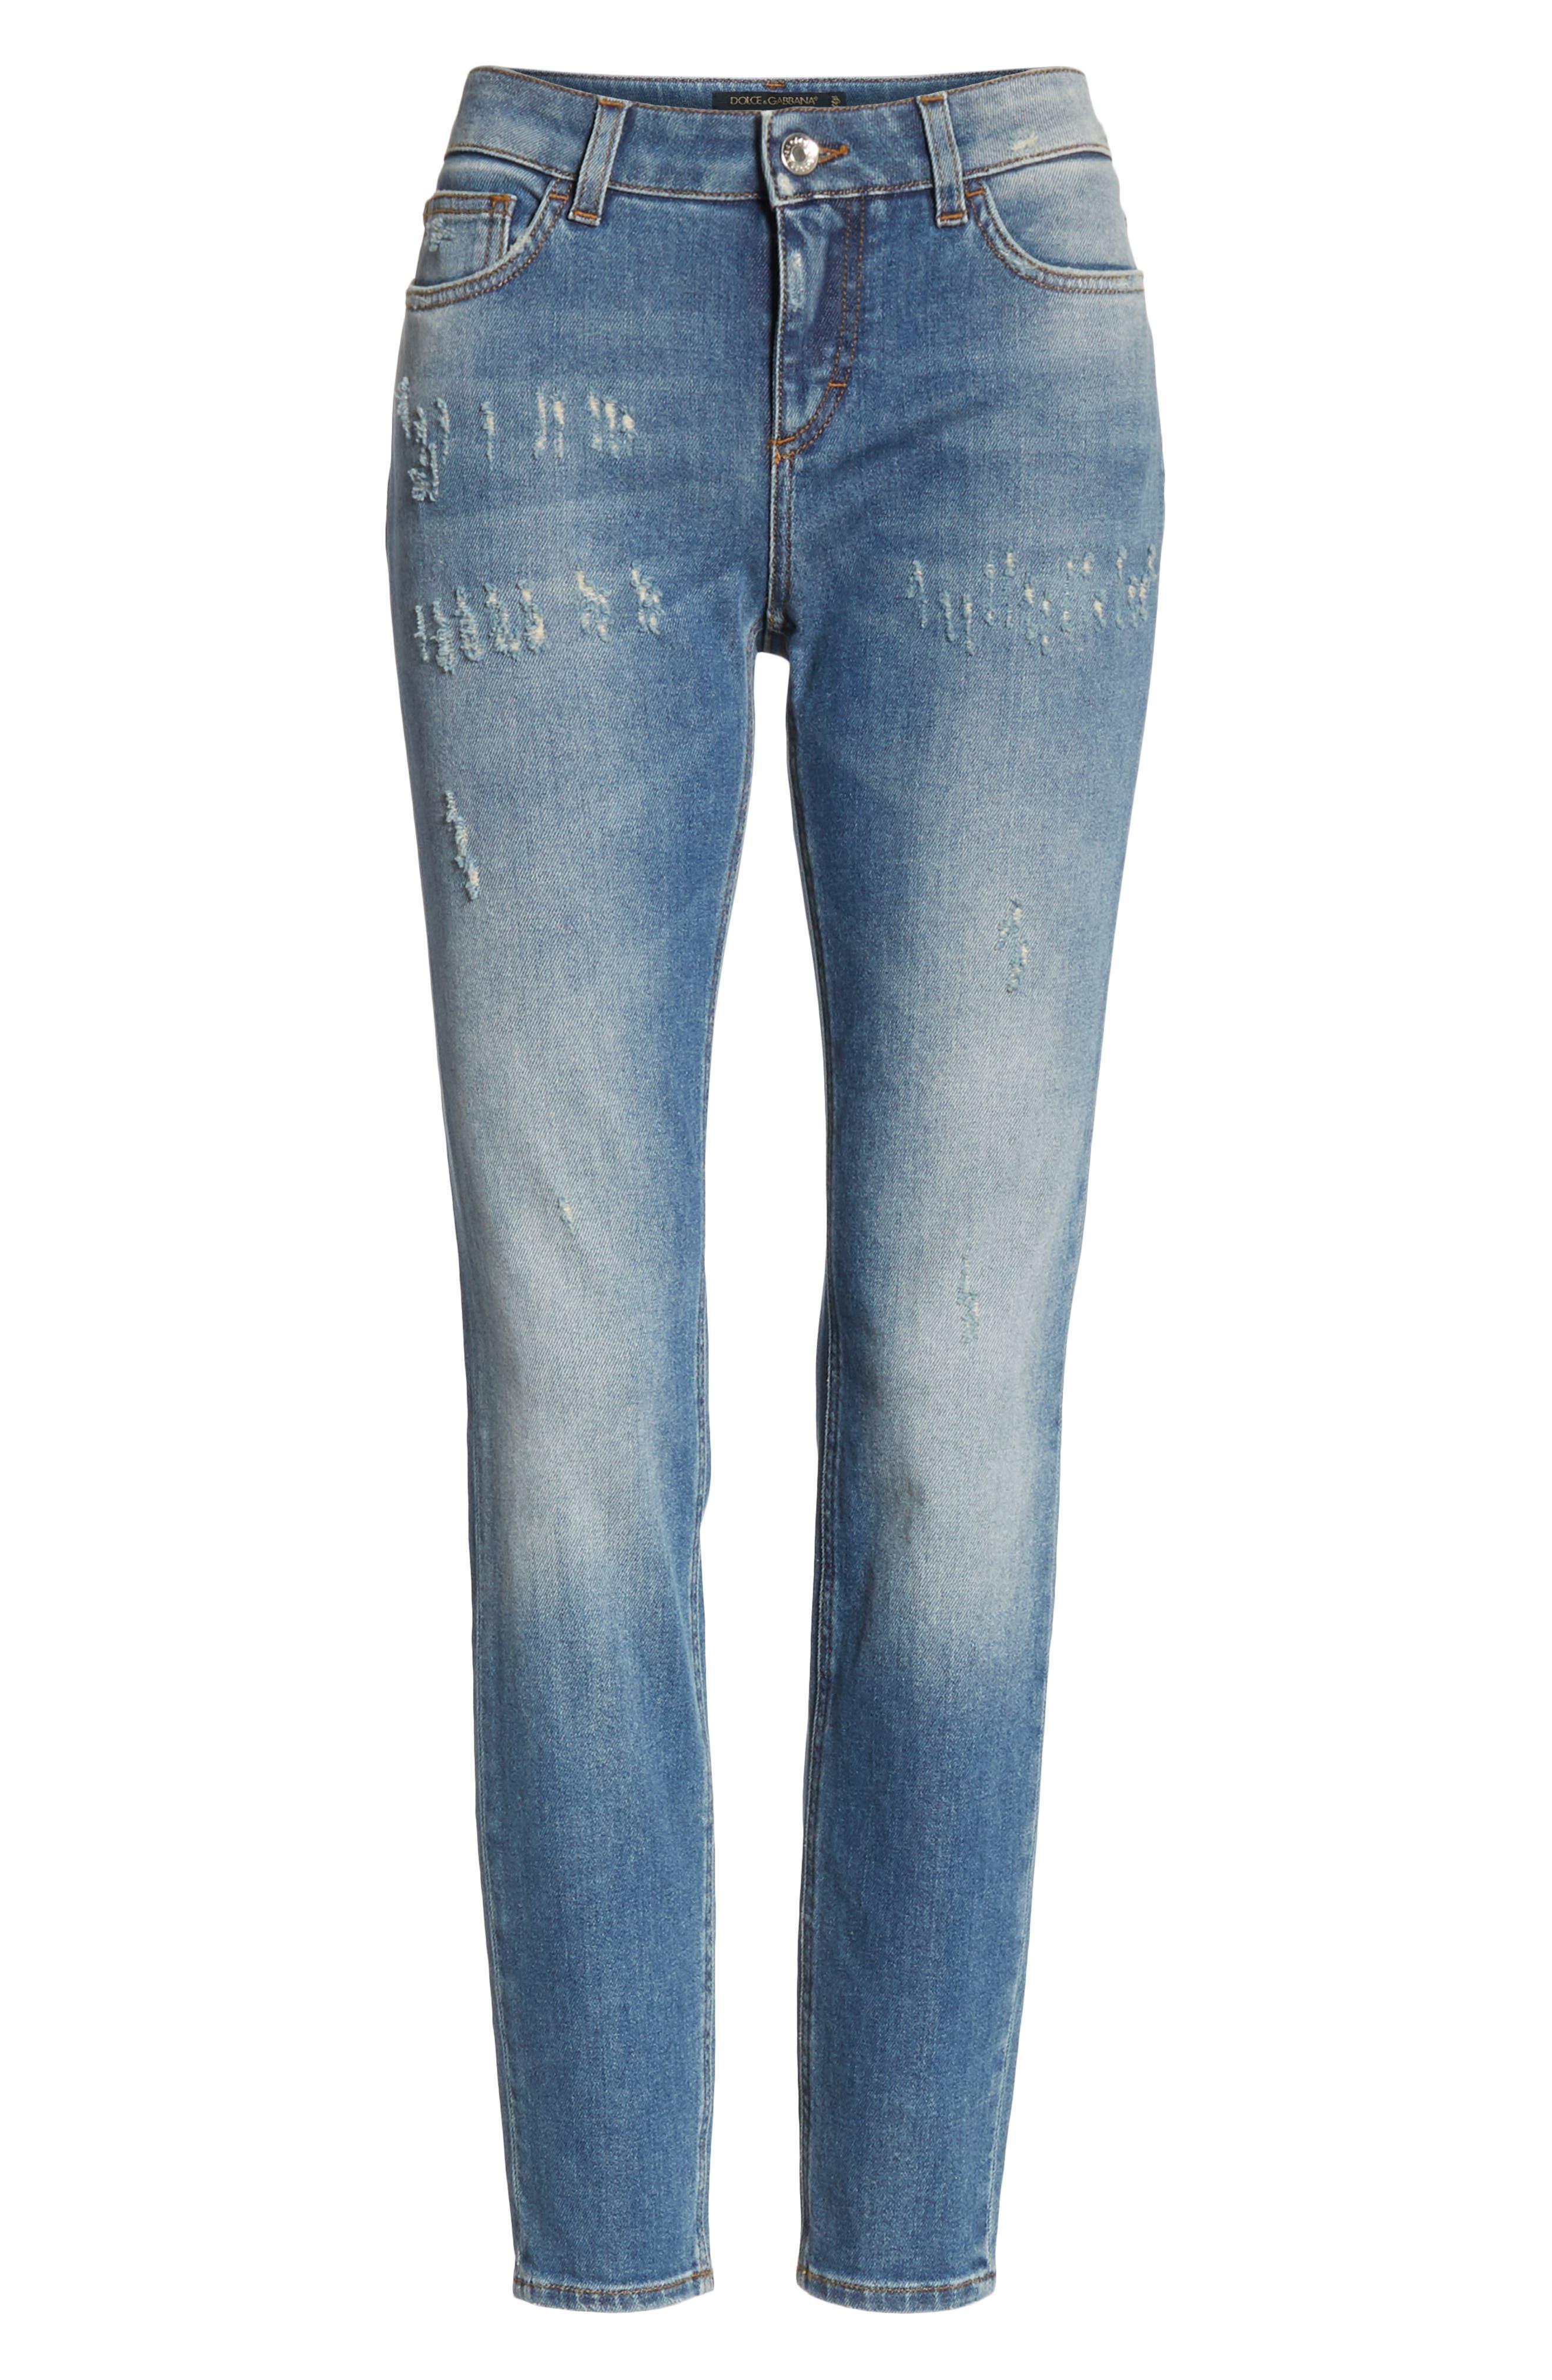 DOLCE&GABBANA, Logo Plaque Skinny Jeans, Alternate thumbnail 6, color, MED BLUE